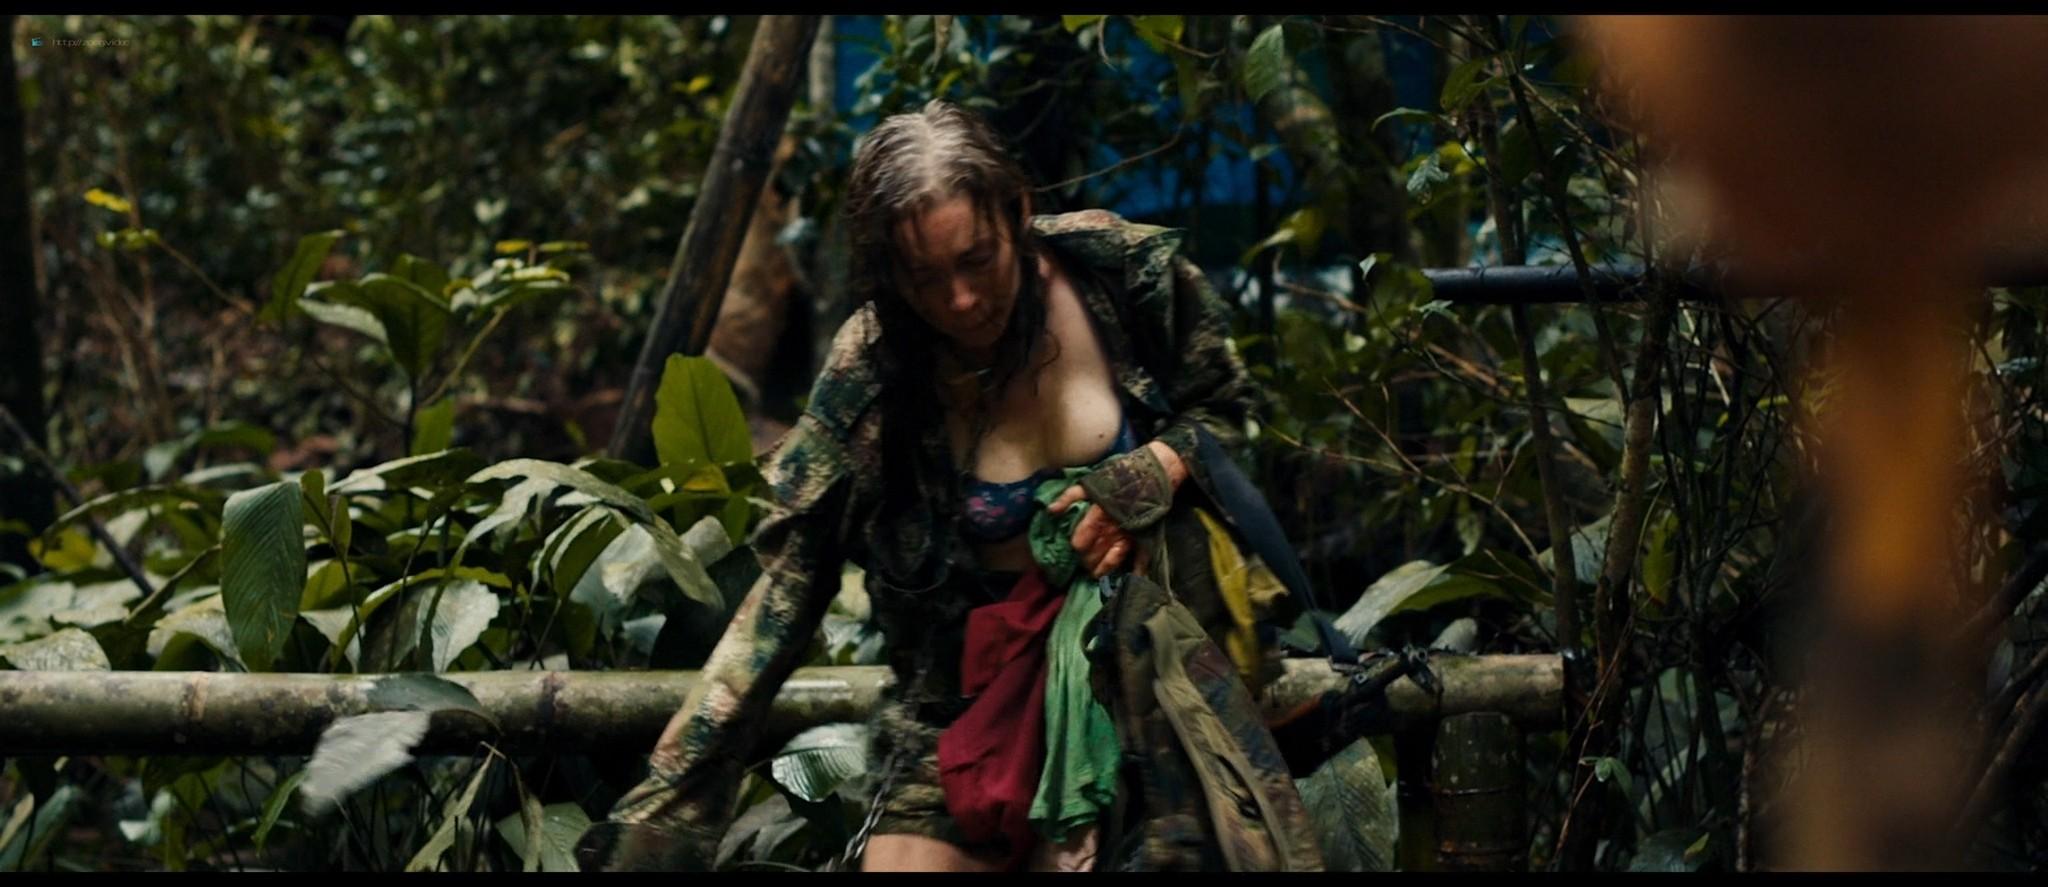 Julianne Nicholson pokies Karen Quintero, Laura Castrillón sexy - Monos (2019) HD 1080p BluRay (2)